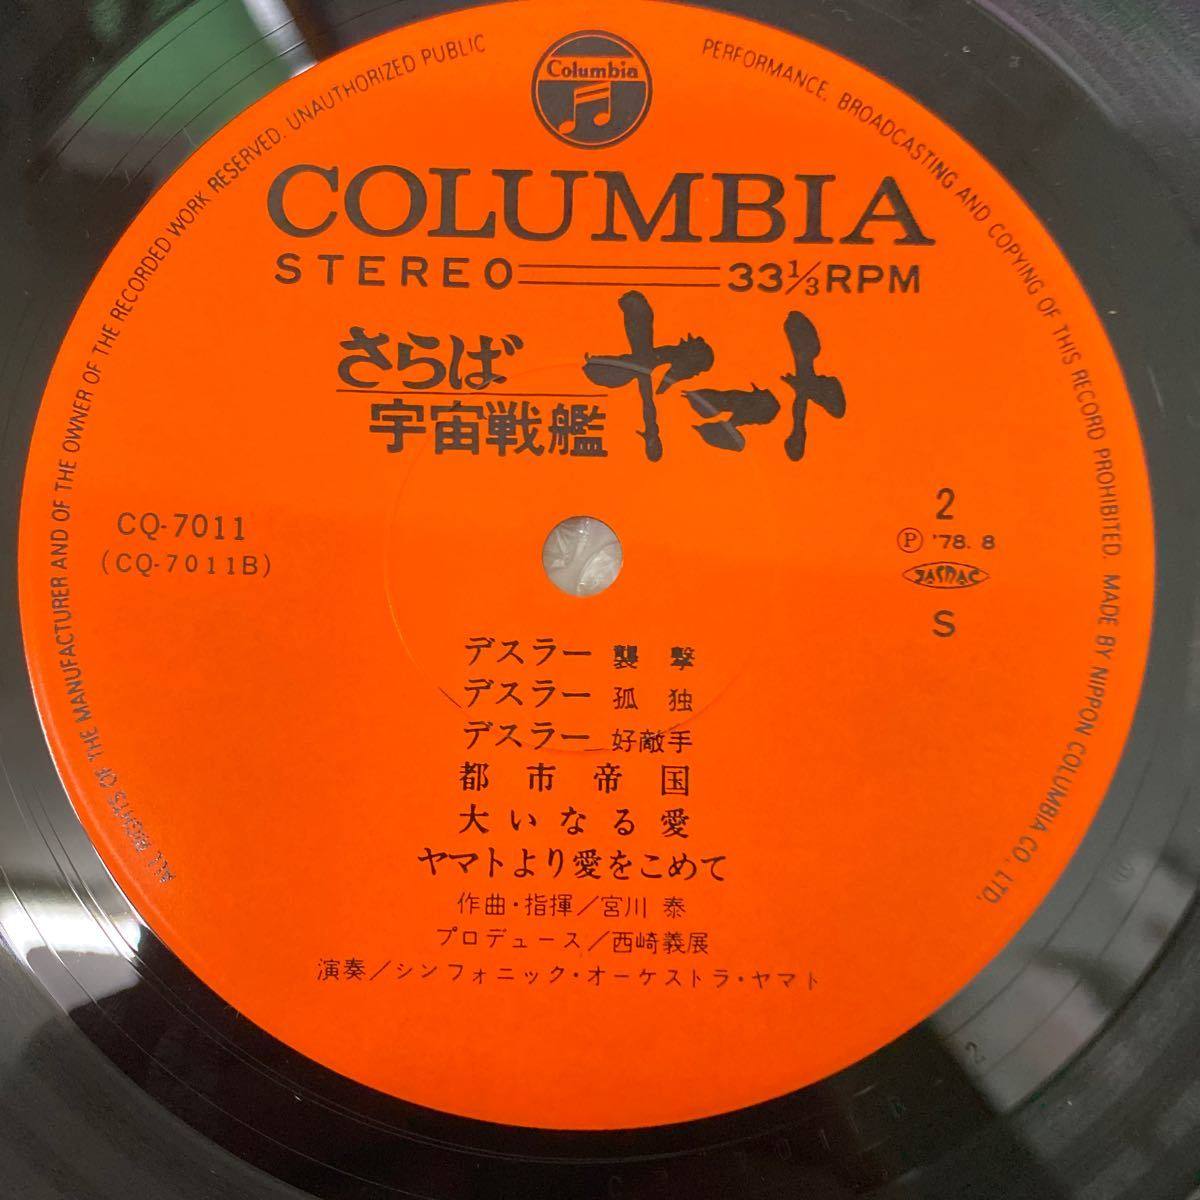 【LP】さらば宇宙戦艦ヤマト 愛の戦士たち 映画音楽集/オリジナルサウンドトラック(CQ-7011)日本コロムビア_画像9